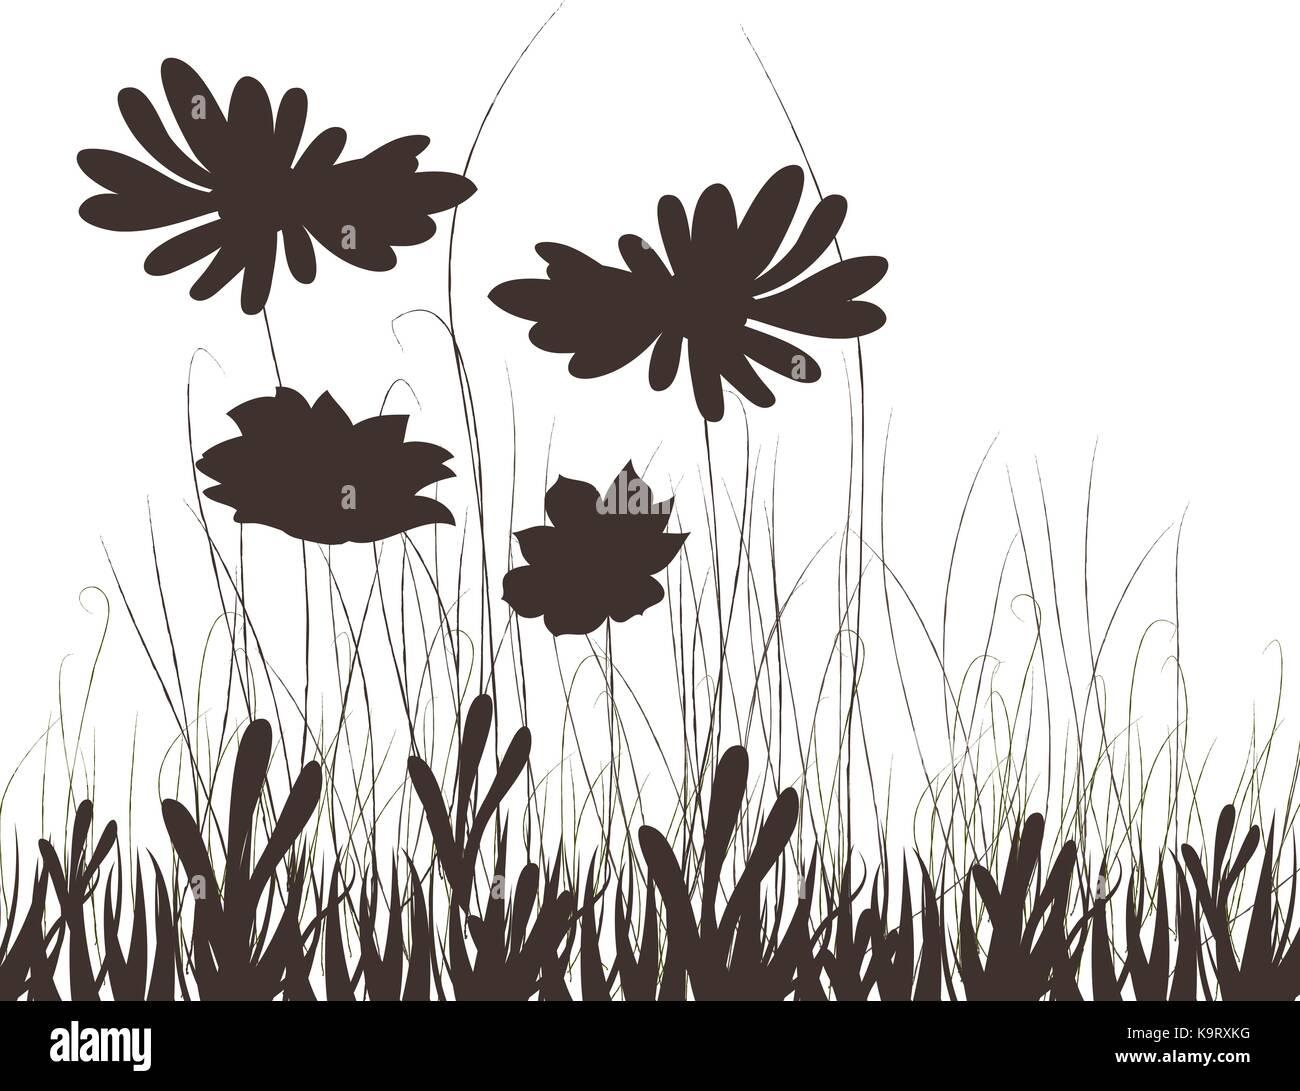 Meadow plants - Stock Vector